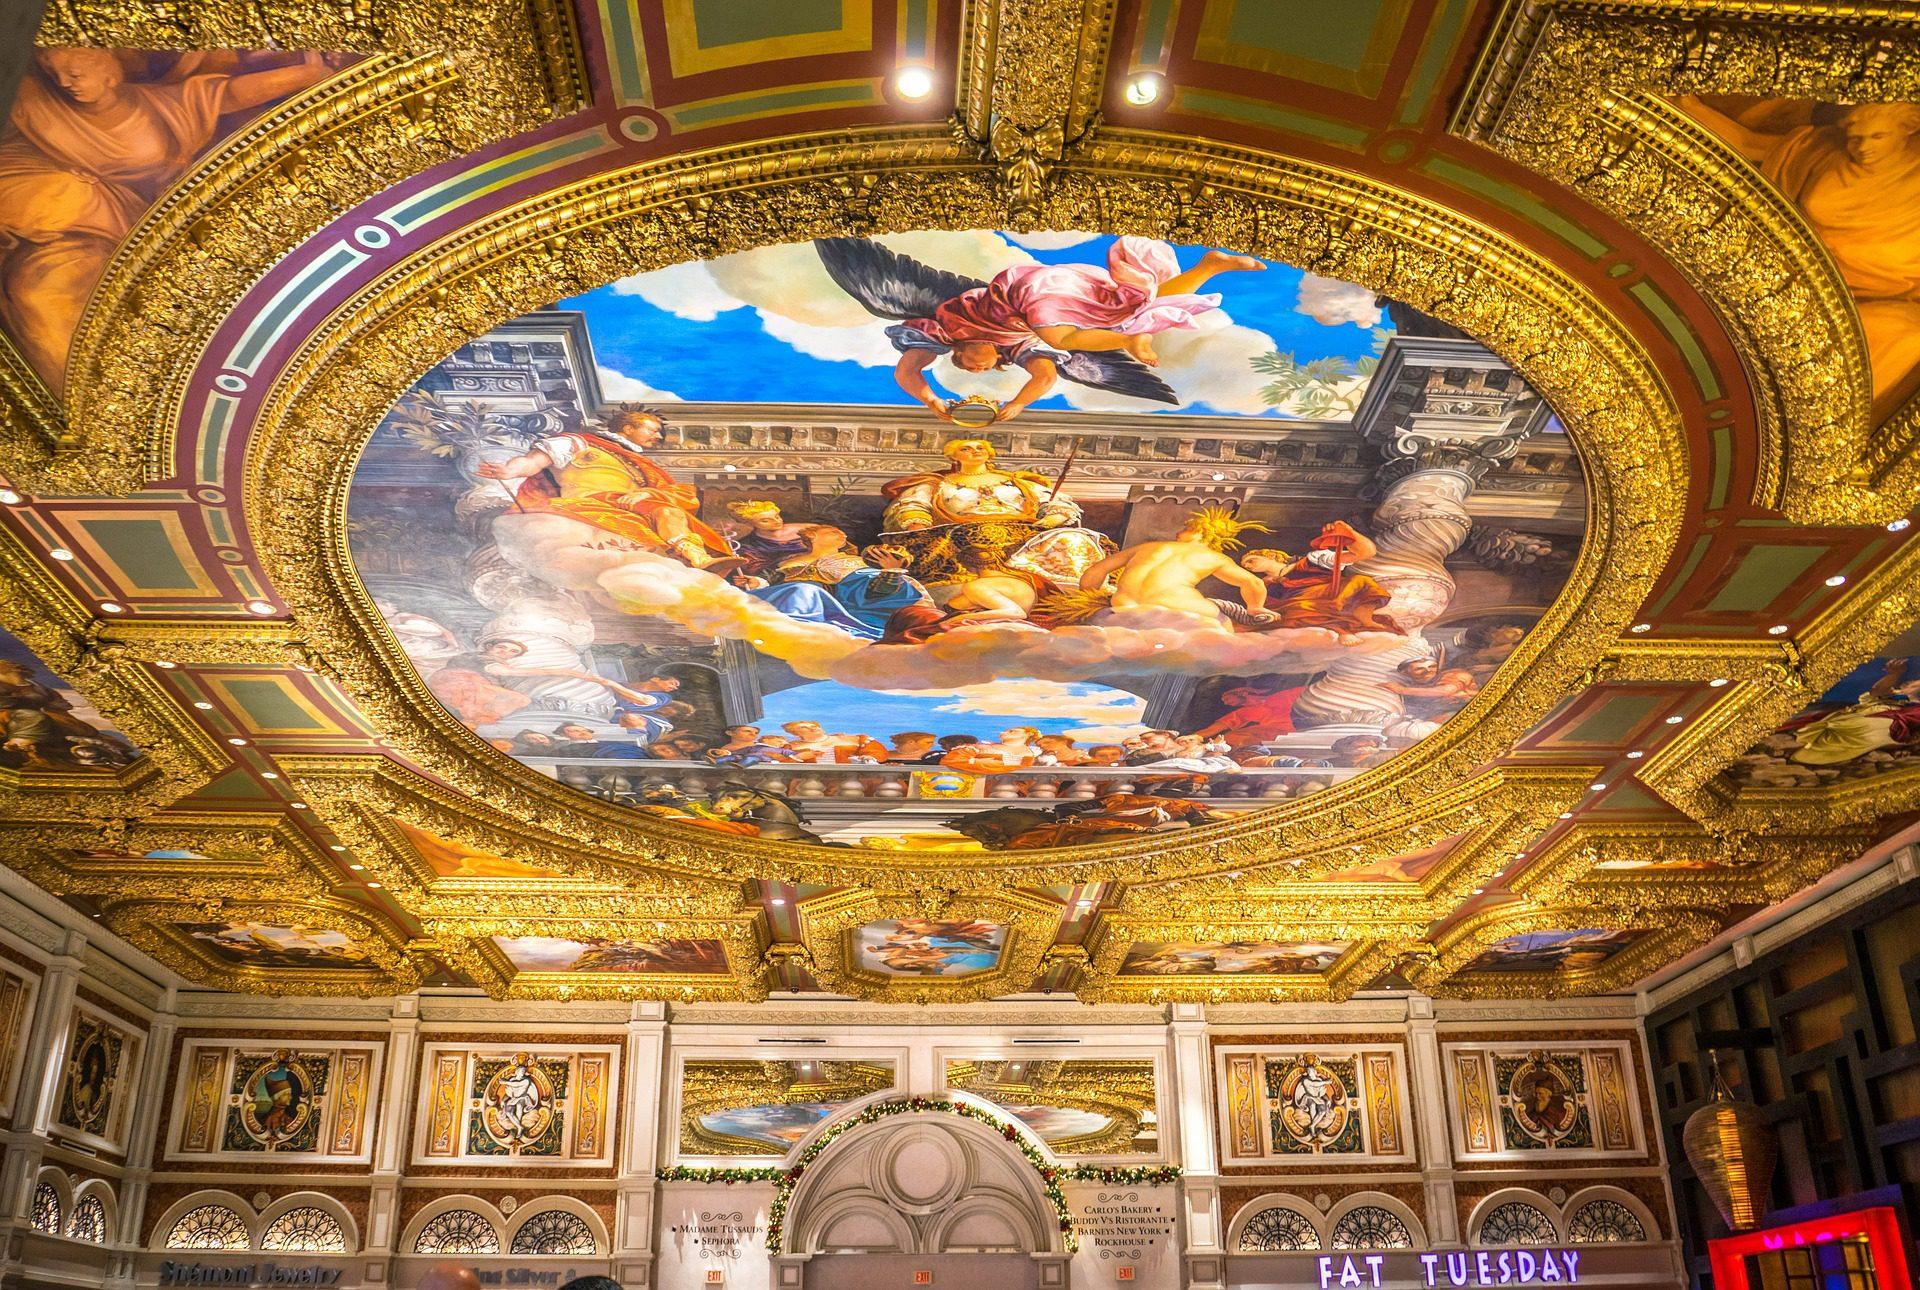 Re-creation of Michelangelo's painted ceiling at The Venetian, Las Vegas